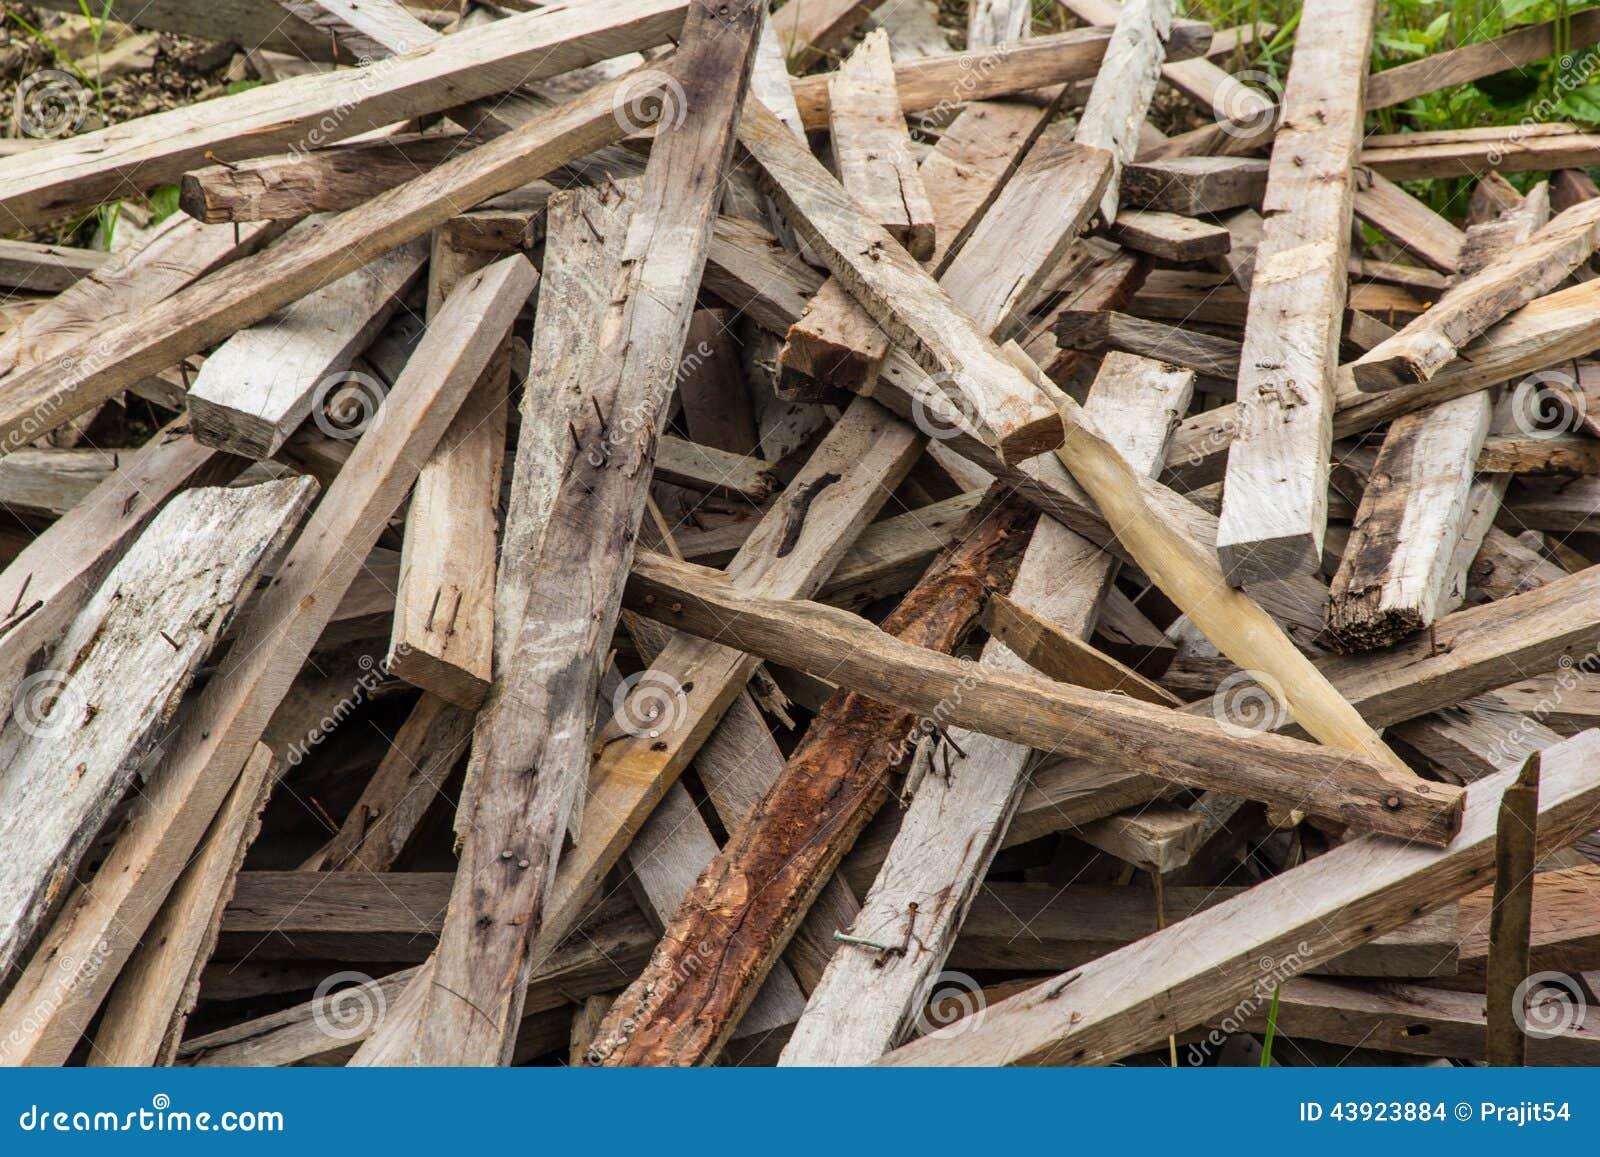 pile scrap wood stock images 498 photos